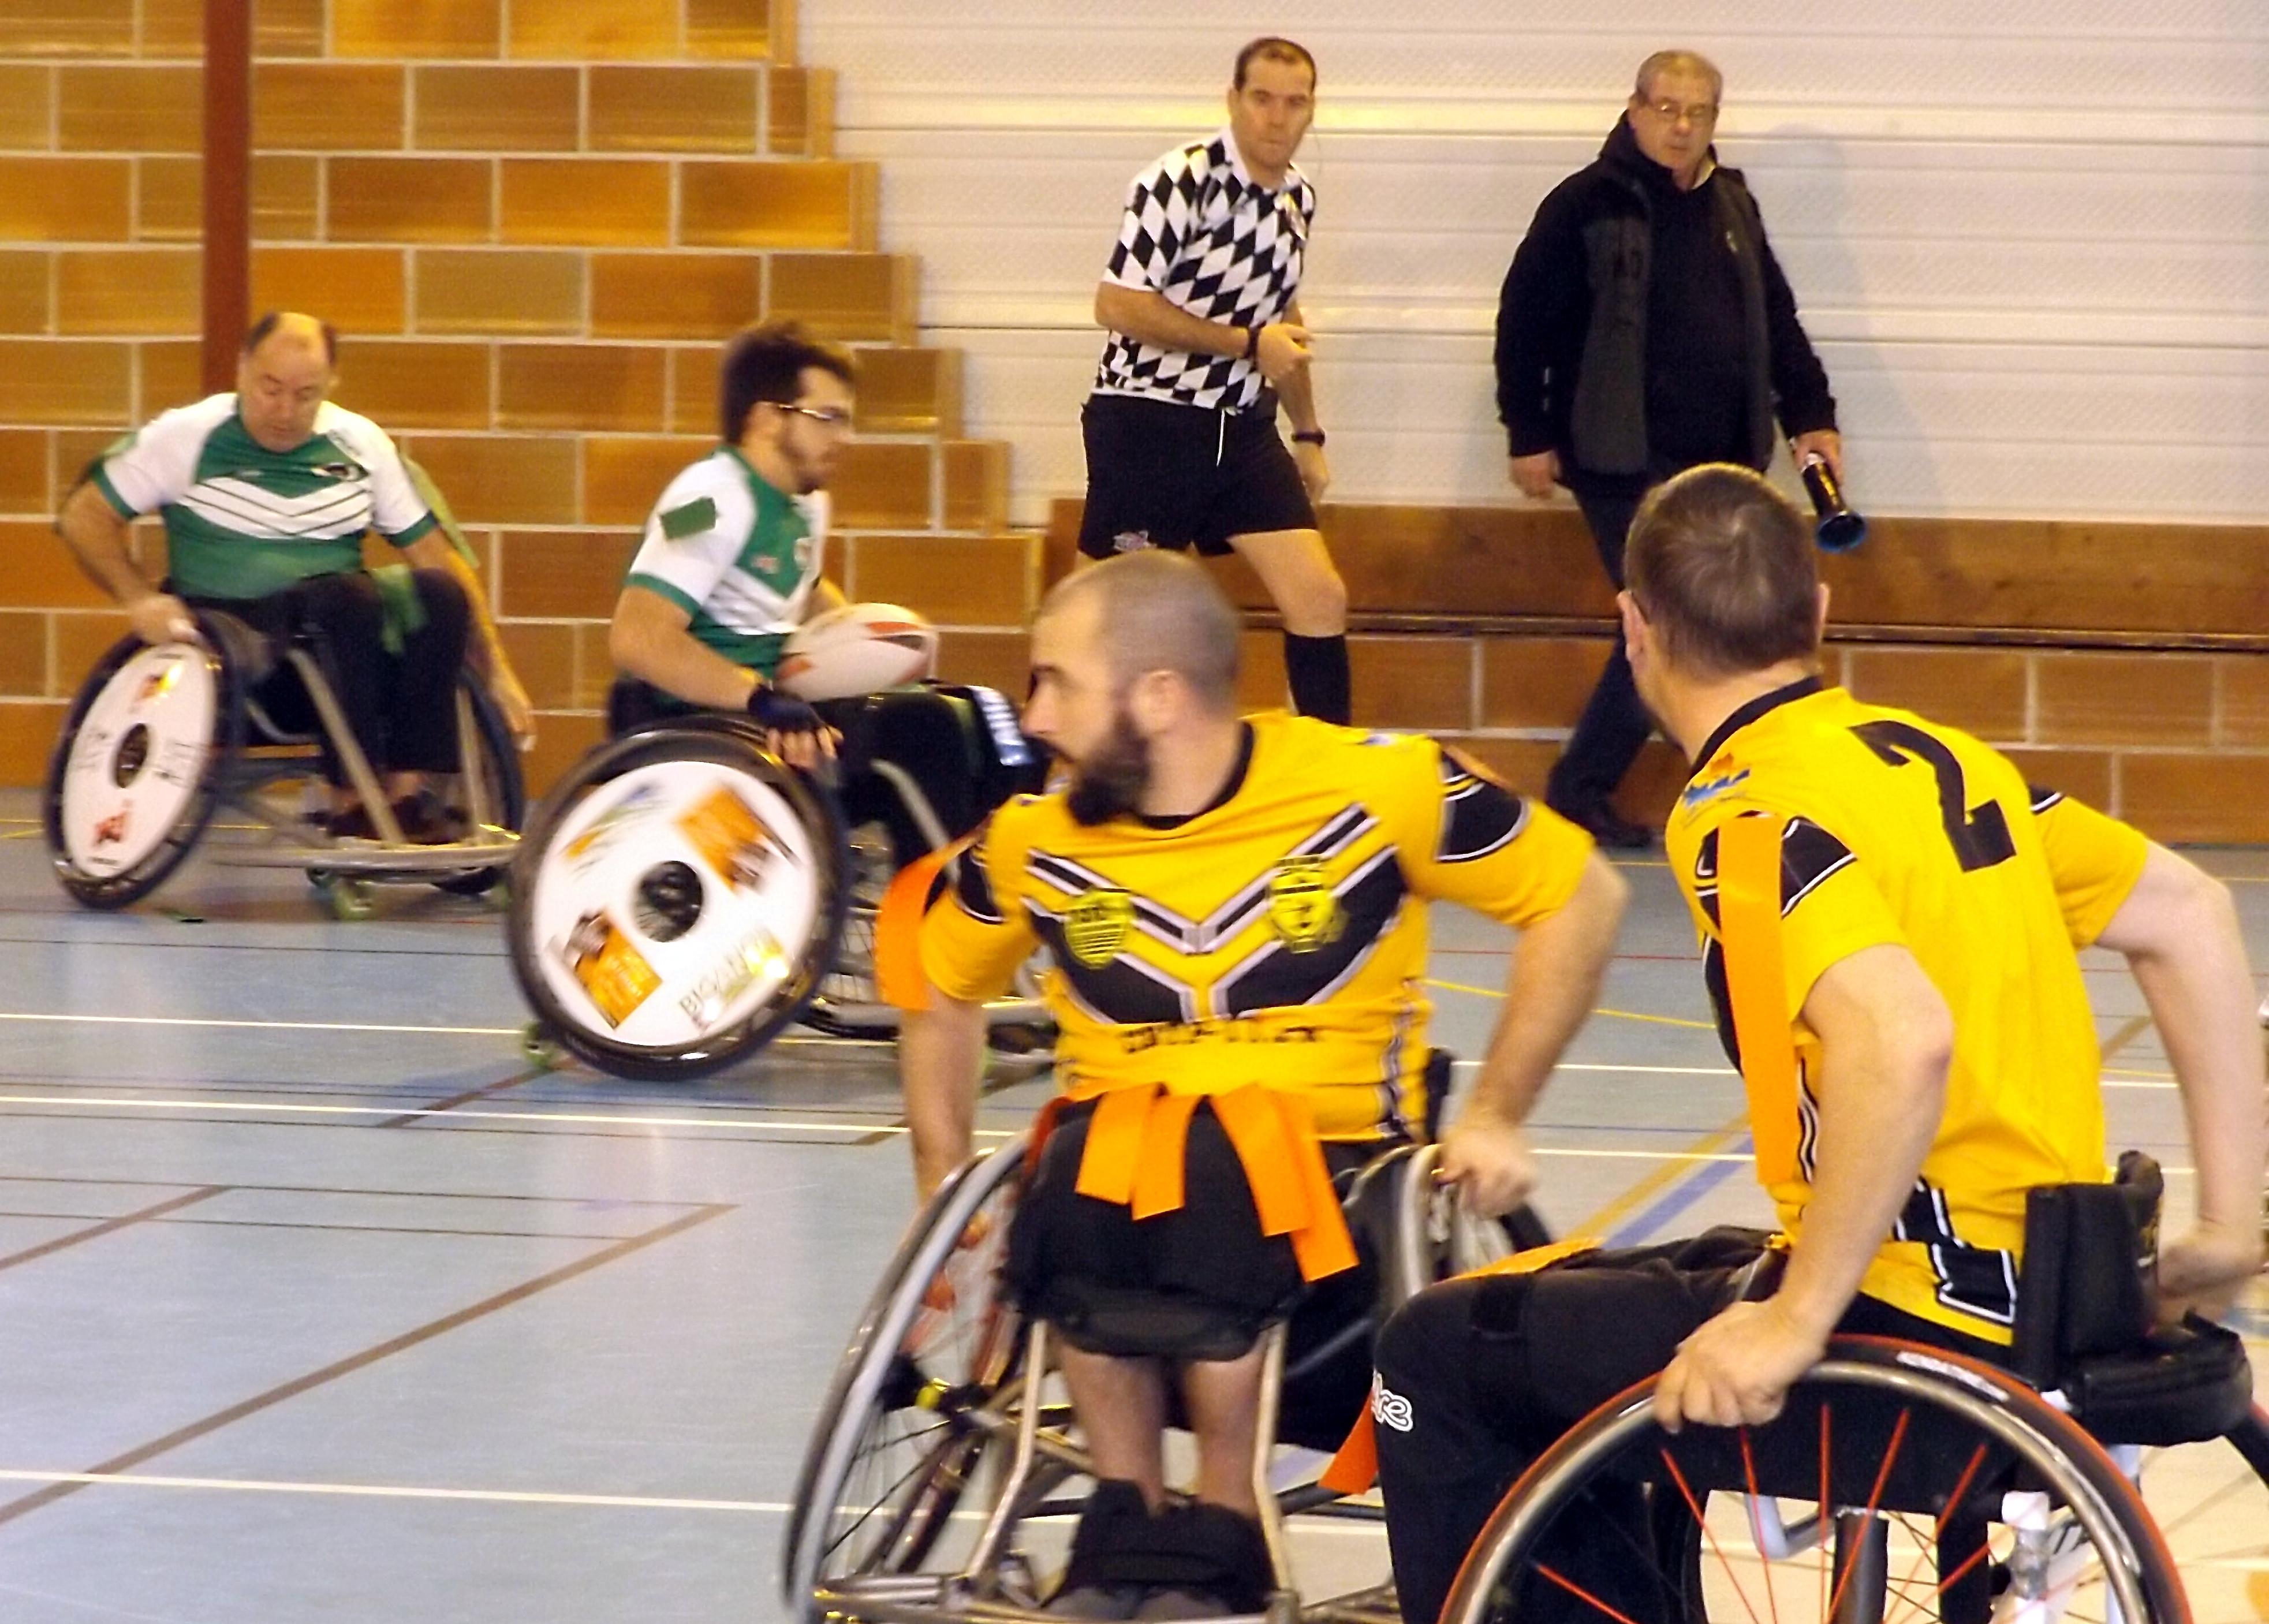 Rugby Xiii Fauteuil Aigles De Biganos Vs Chevaliers Cathares De